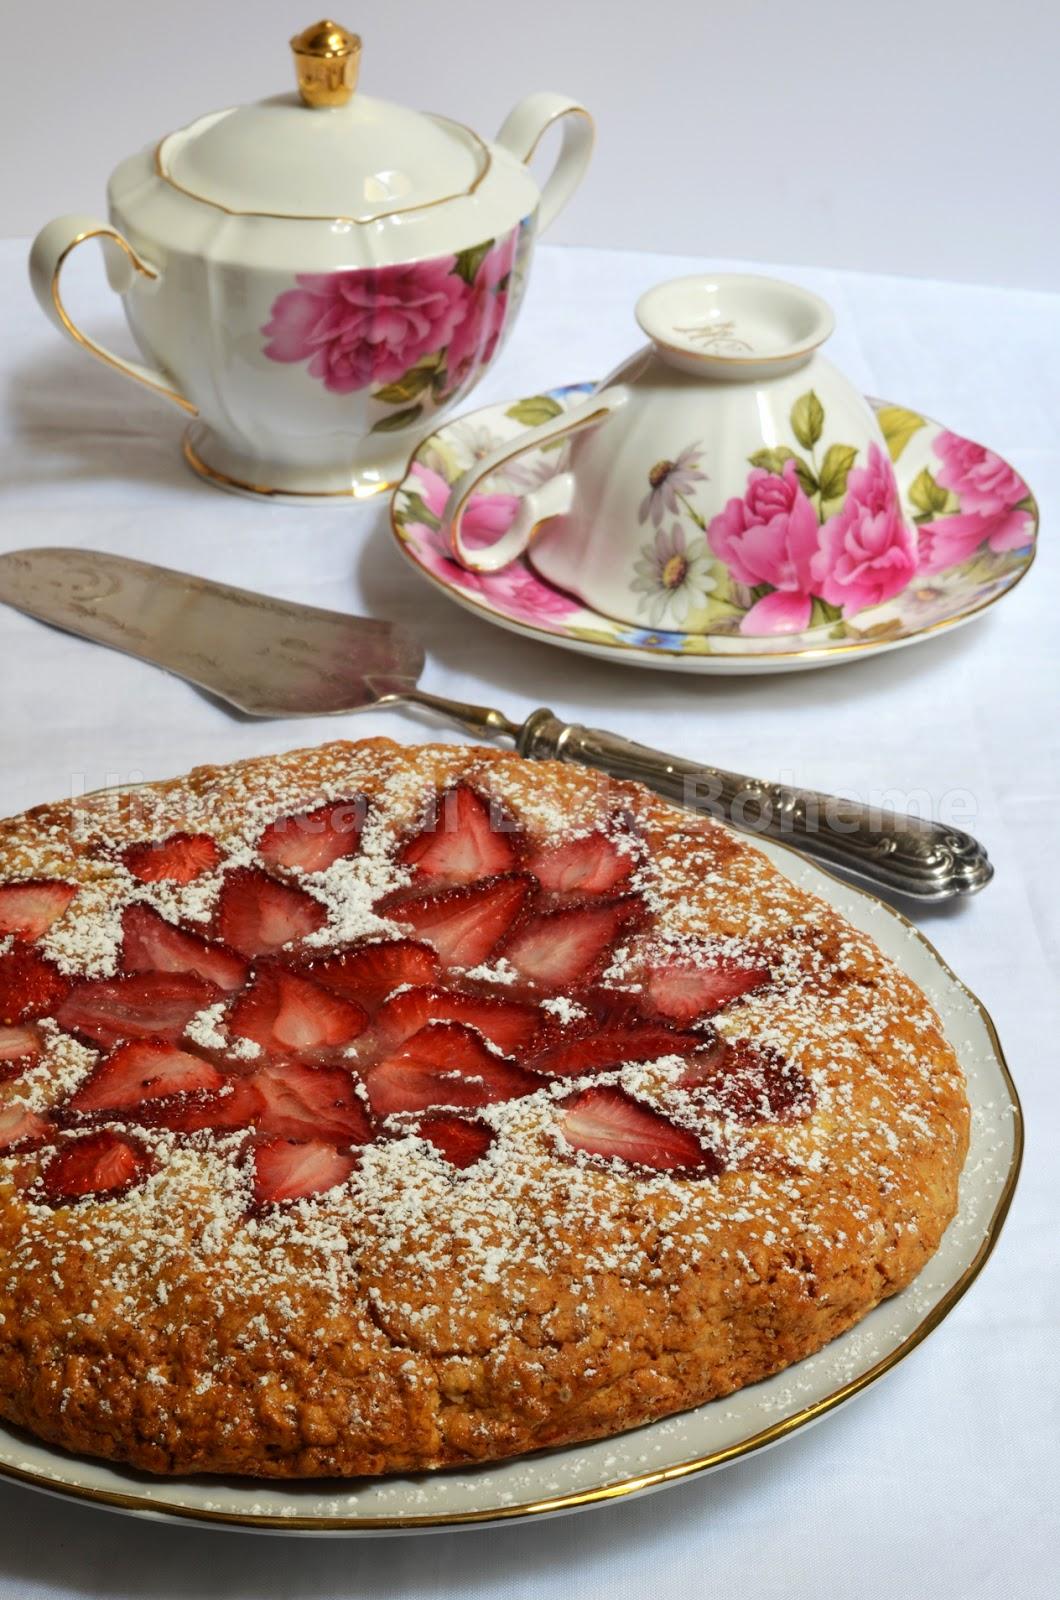 hiperica_lady_boheme_blog_cucina_ricette_gustose_facili_veloci_crostata_di_fragole_senza_crema_1